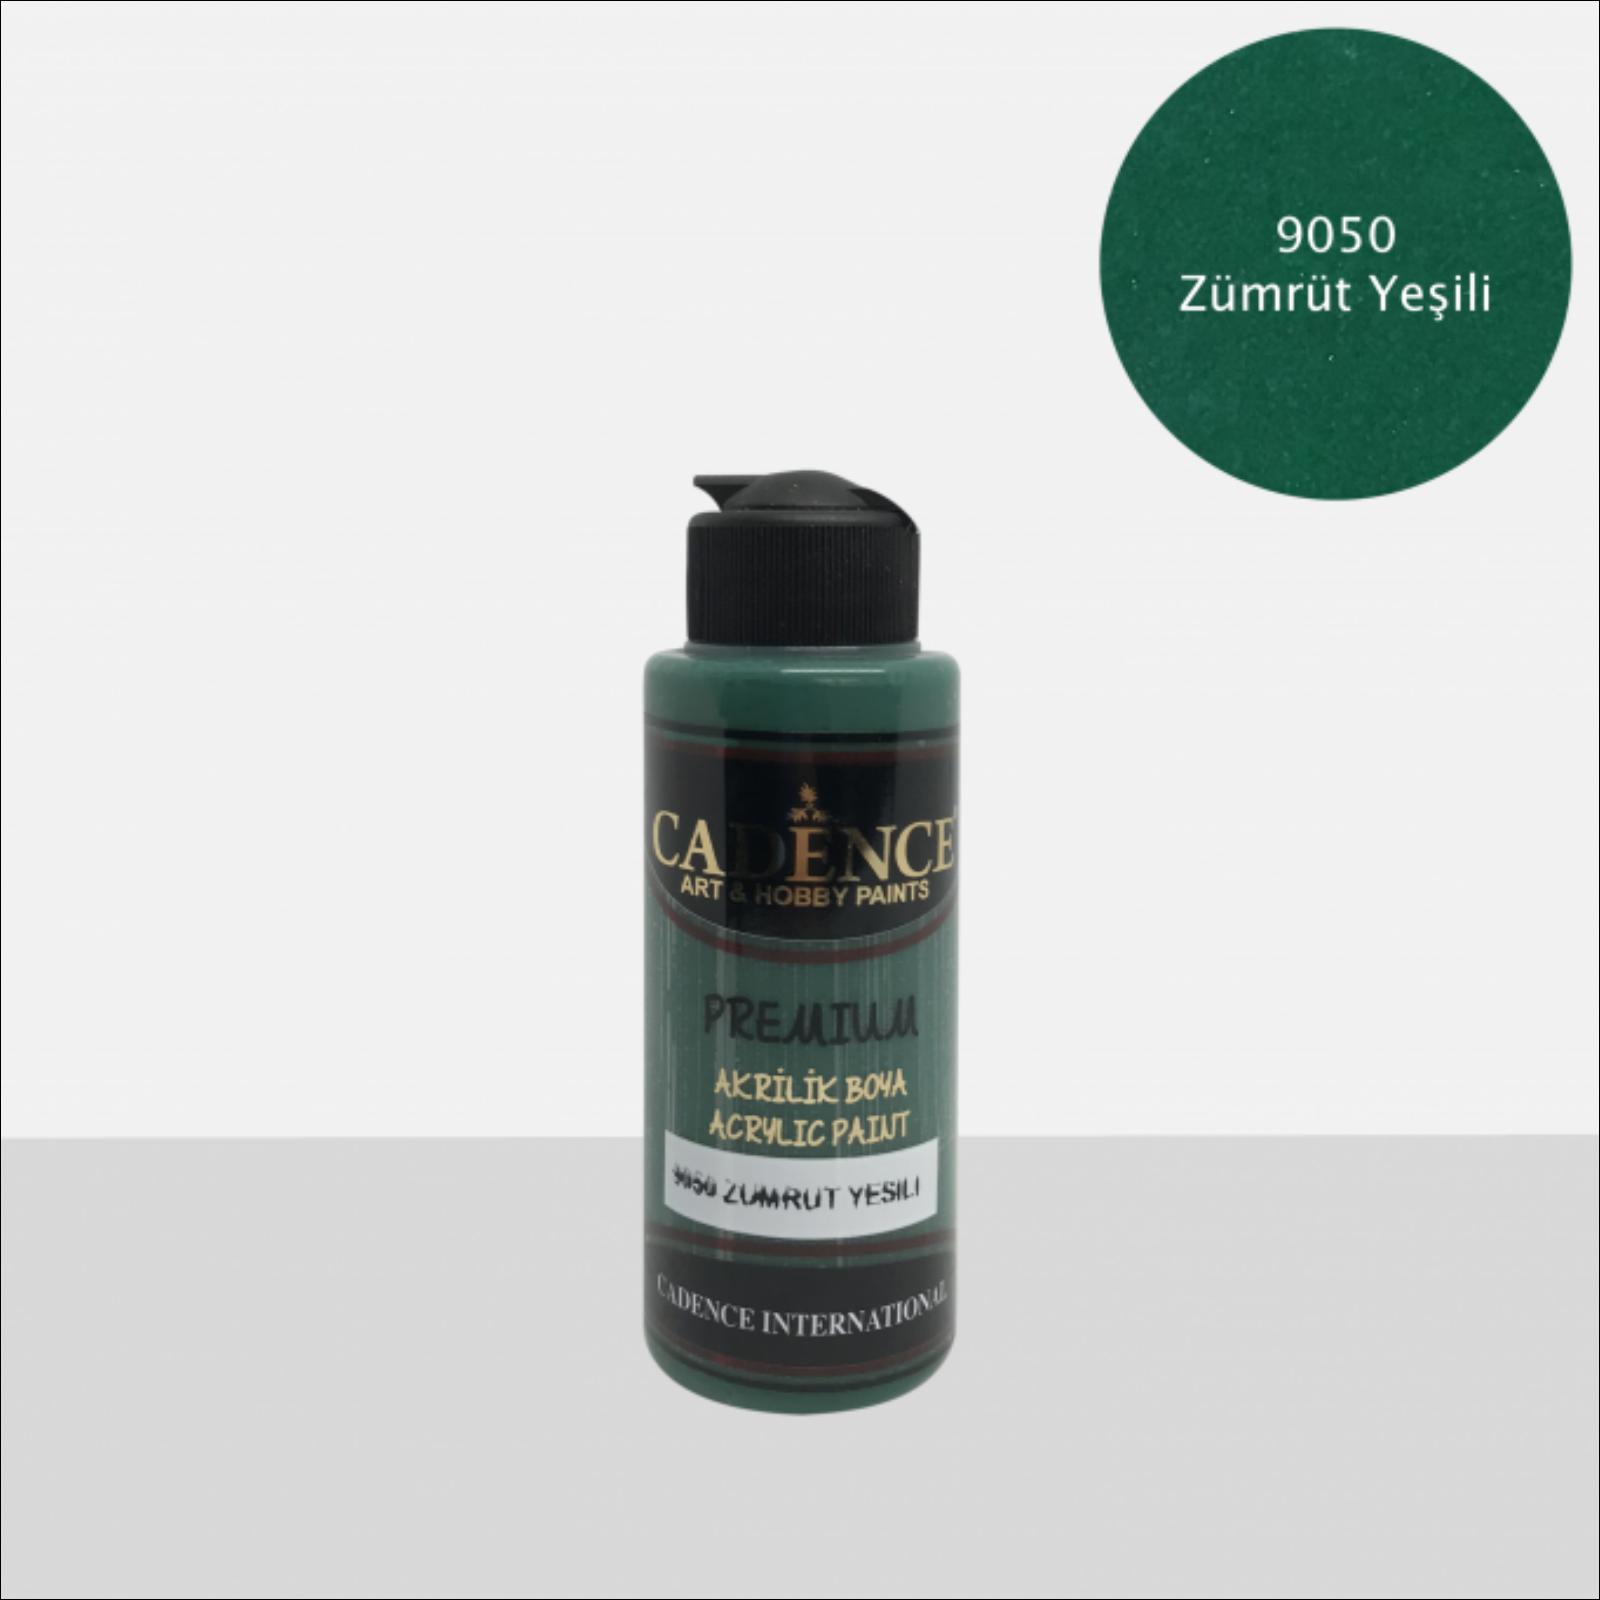 Premium akrilfesték [Emerald green] 70ml